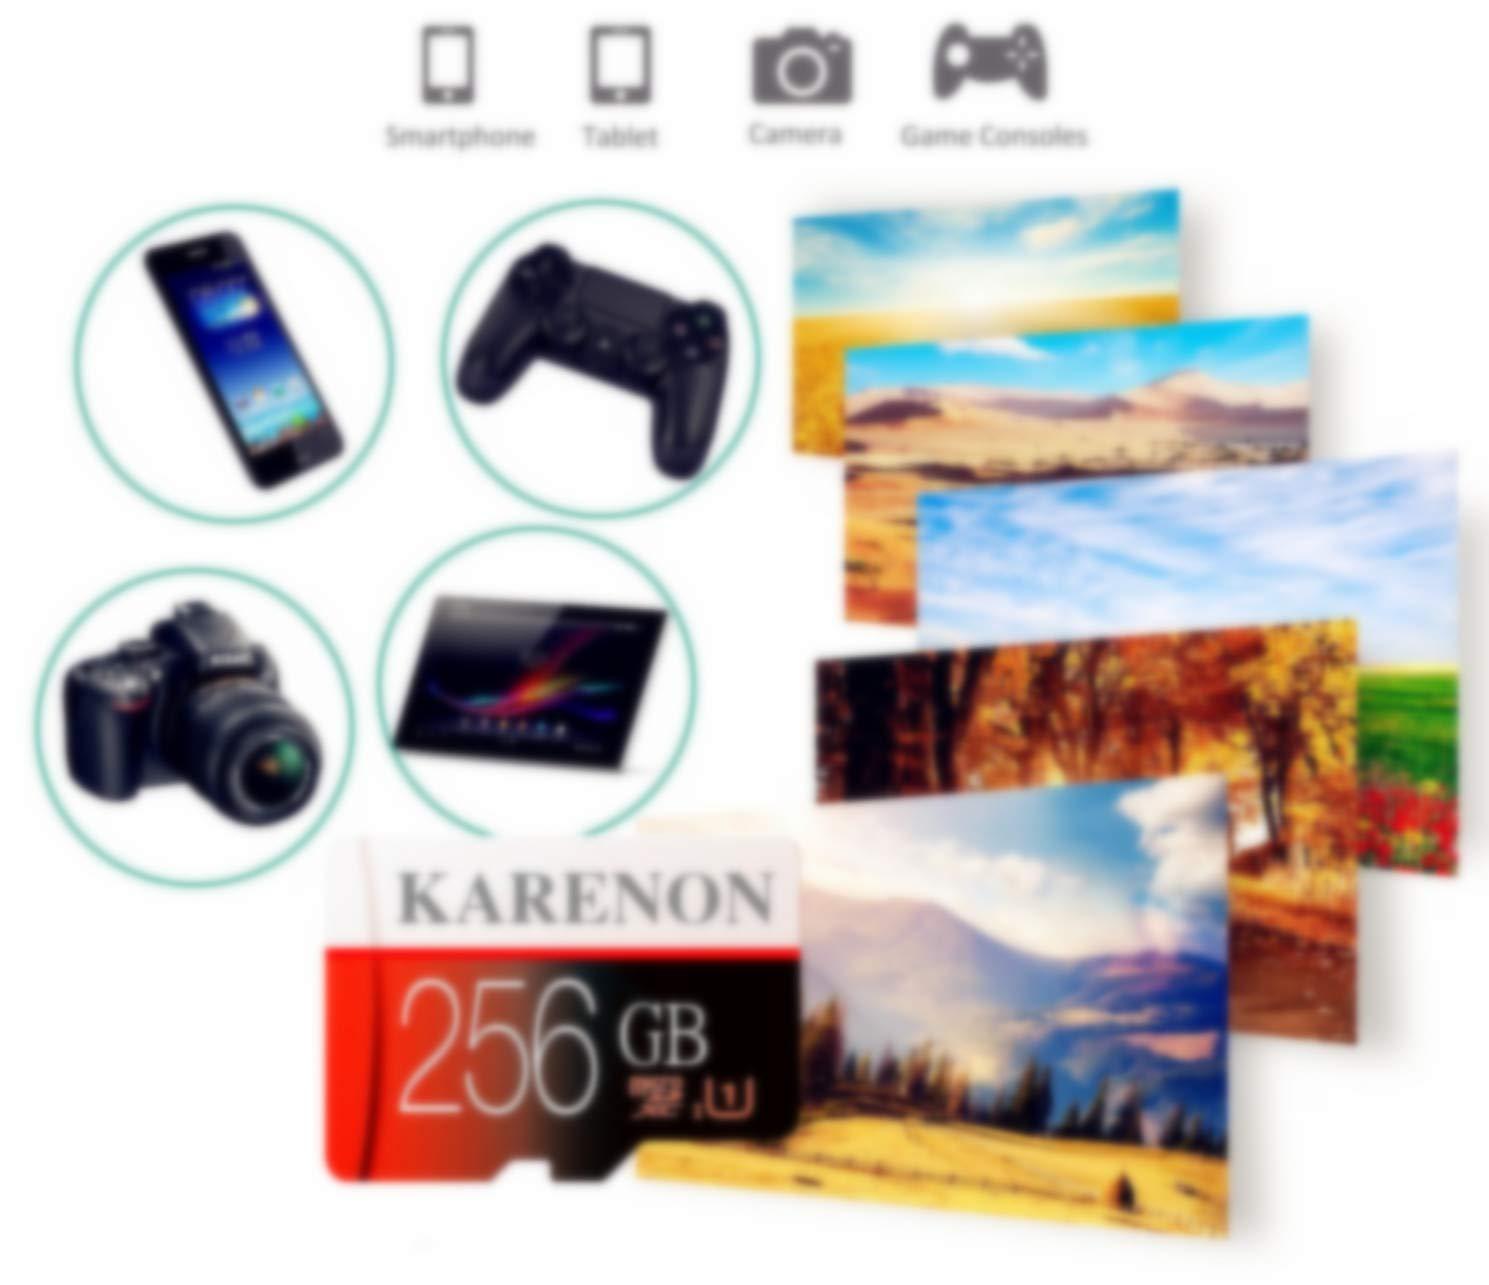 Karenon Tarjeta Micro SD 256 GB, microSDXC 256 GB Class 10 Tarjeta ...